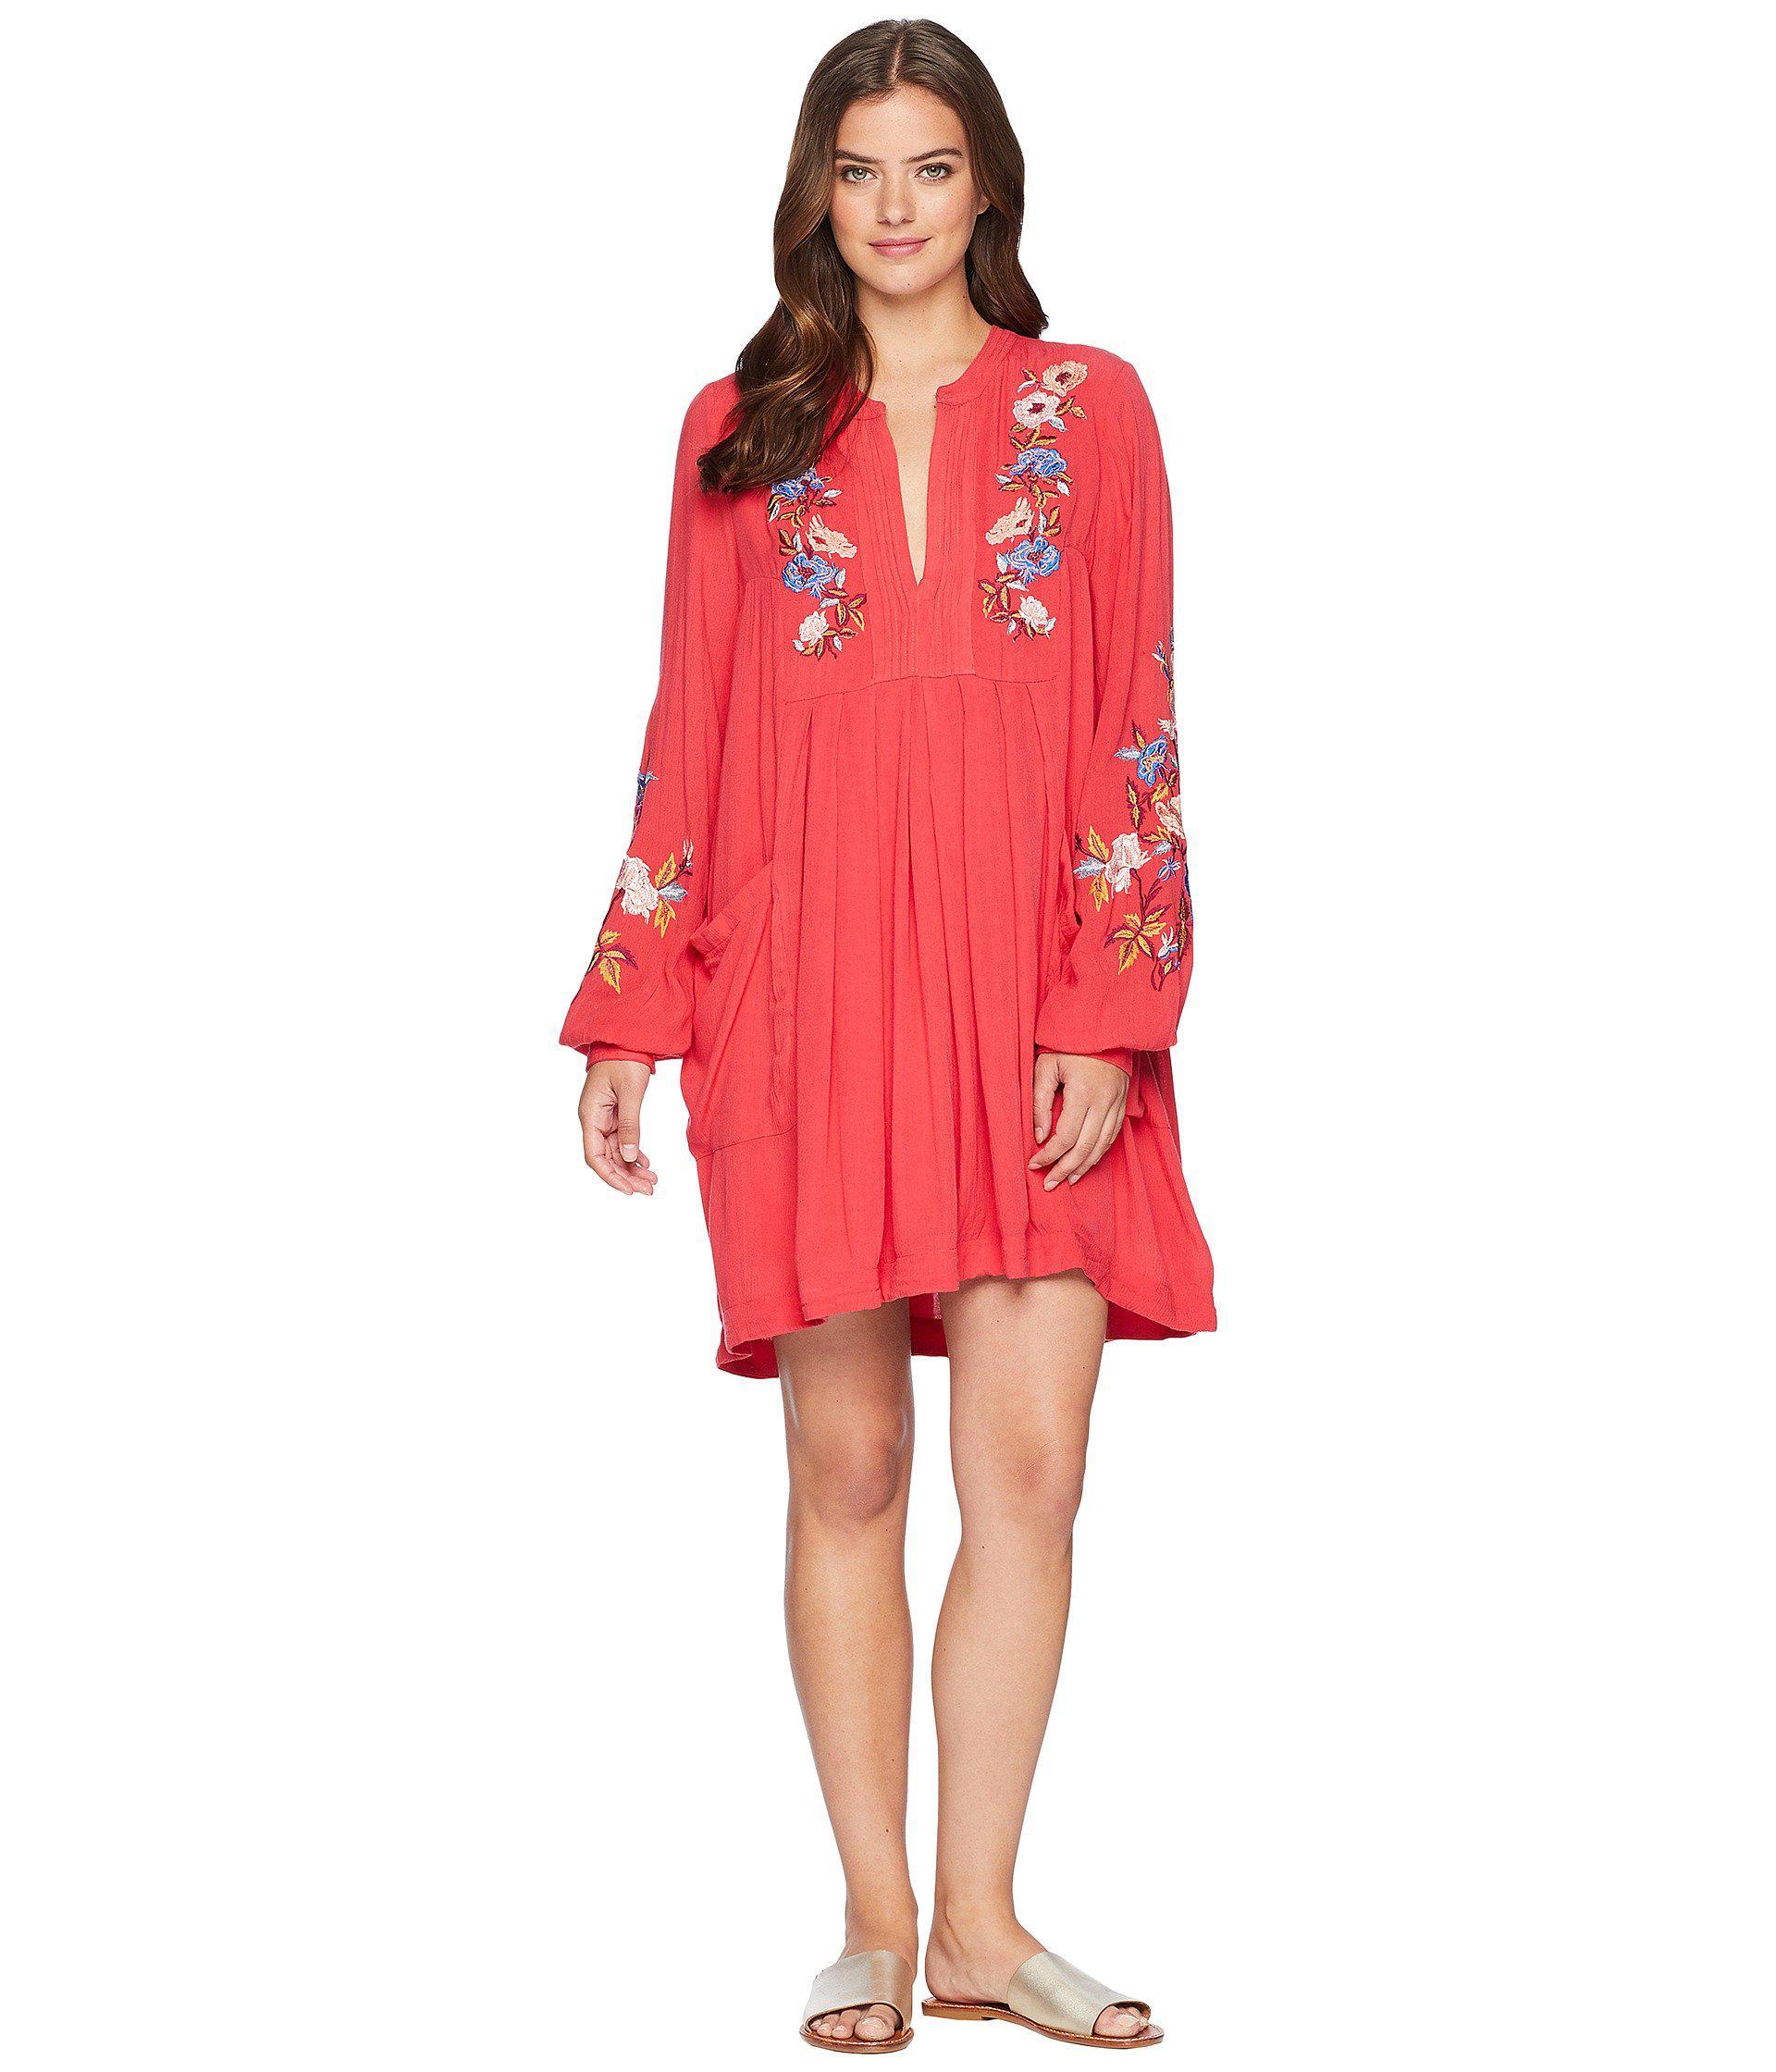 ec1b651ddb Free People Mia Gauze Embroidered Mini (red) Women s Dress in Red - Lyst